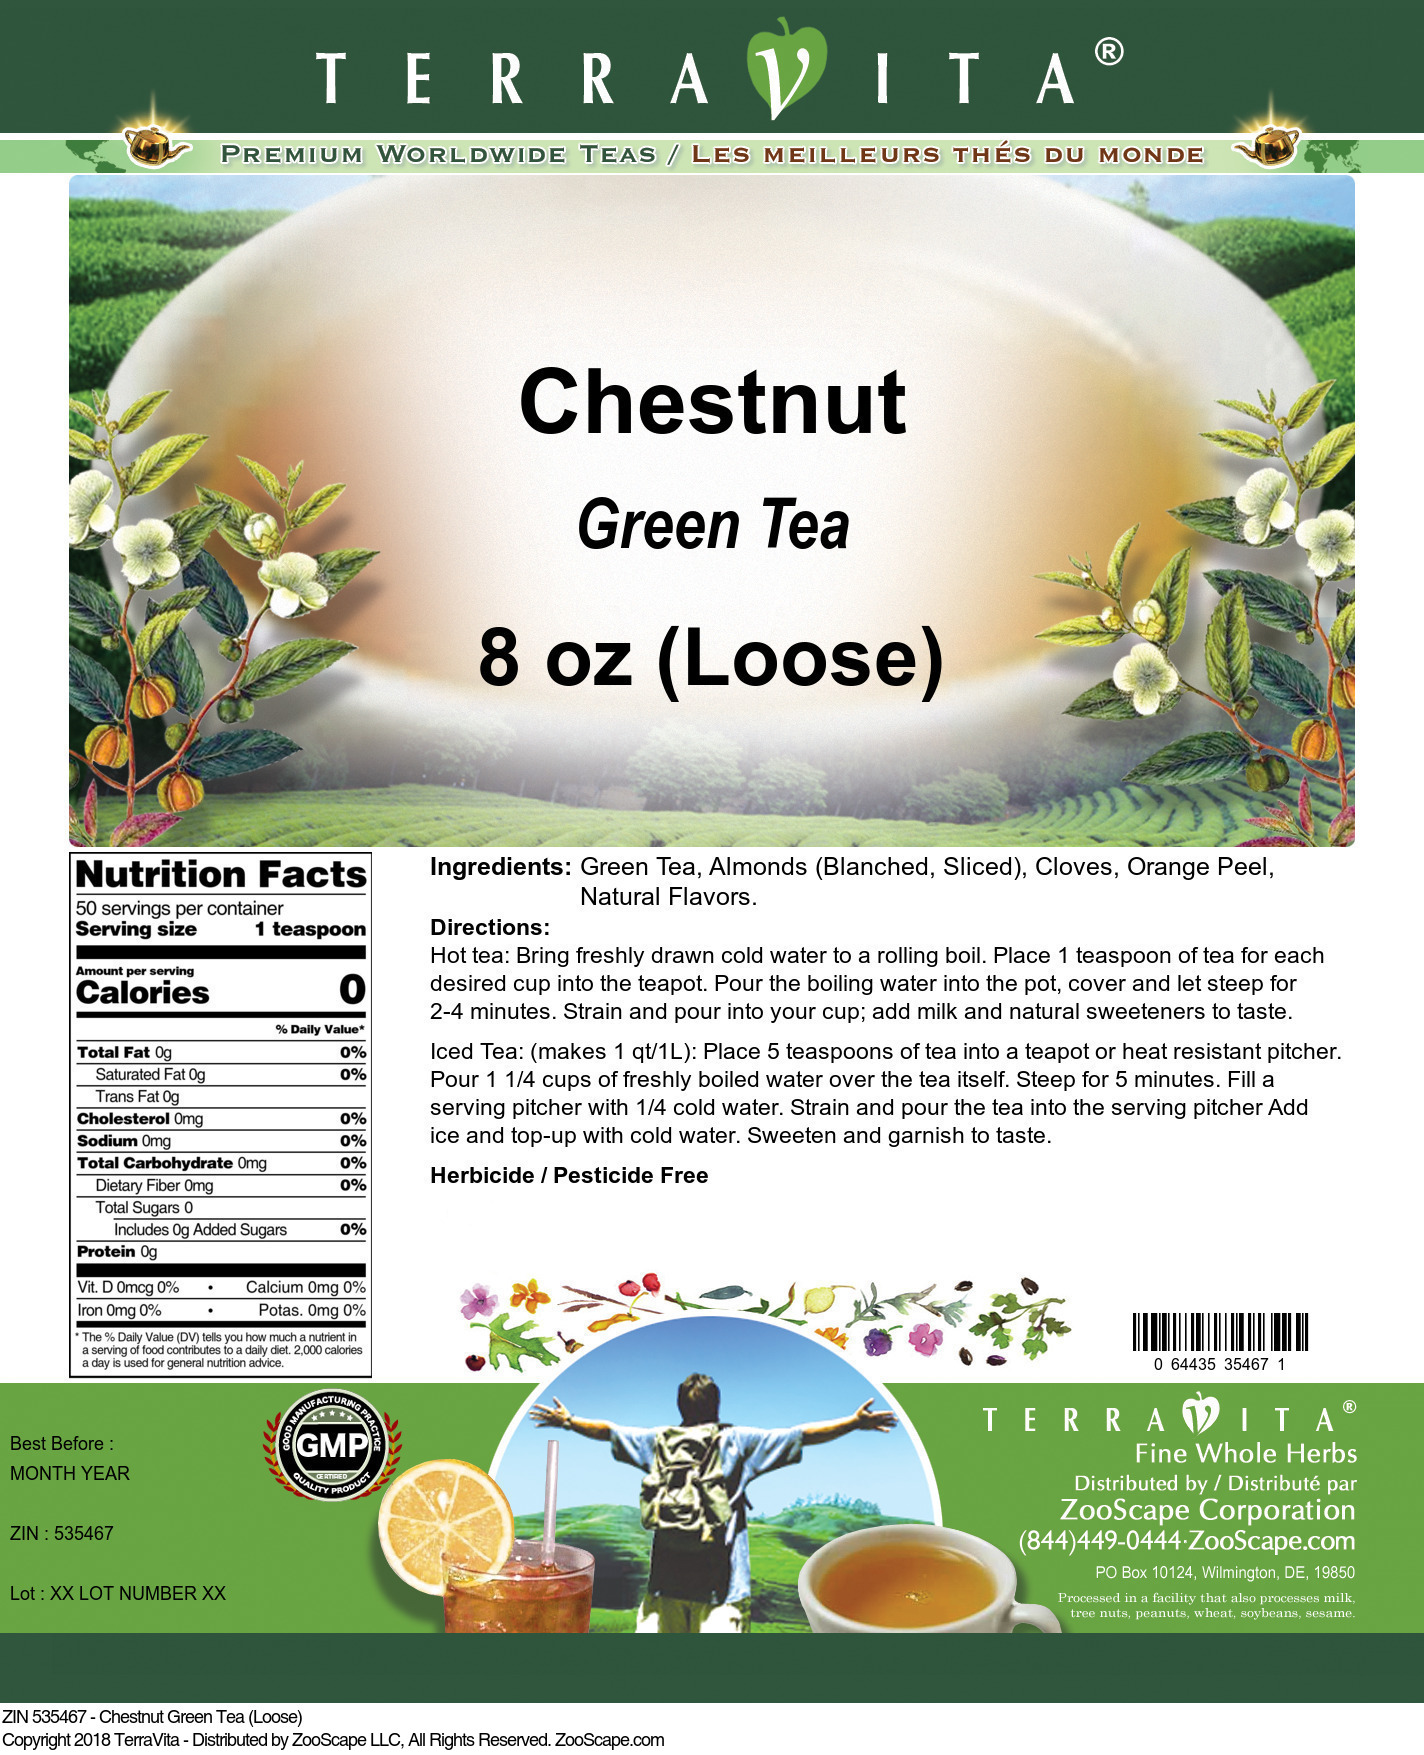 Chestnut Green Tea (Loose)